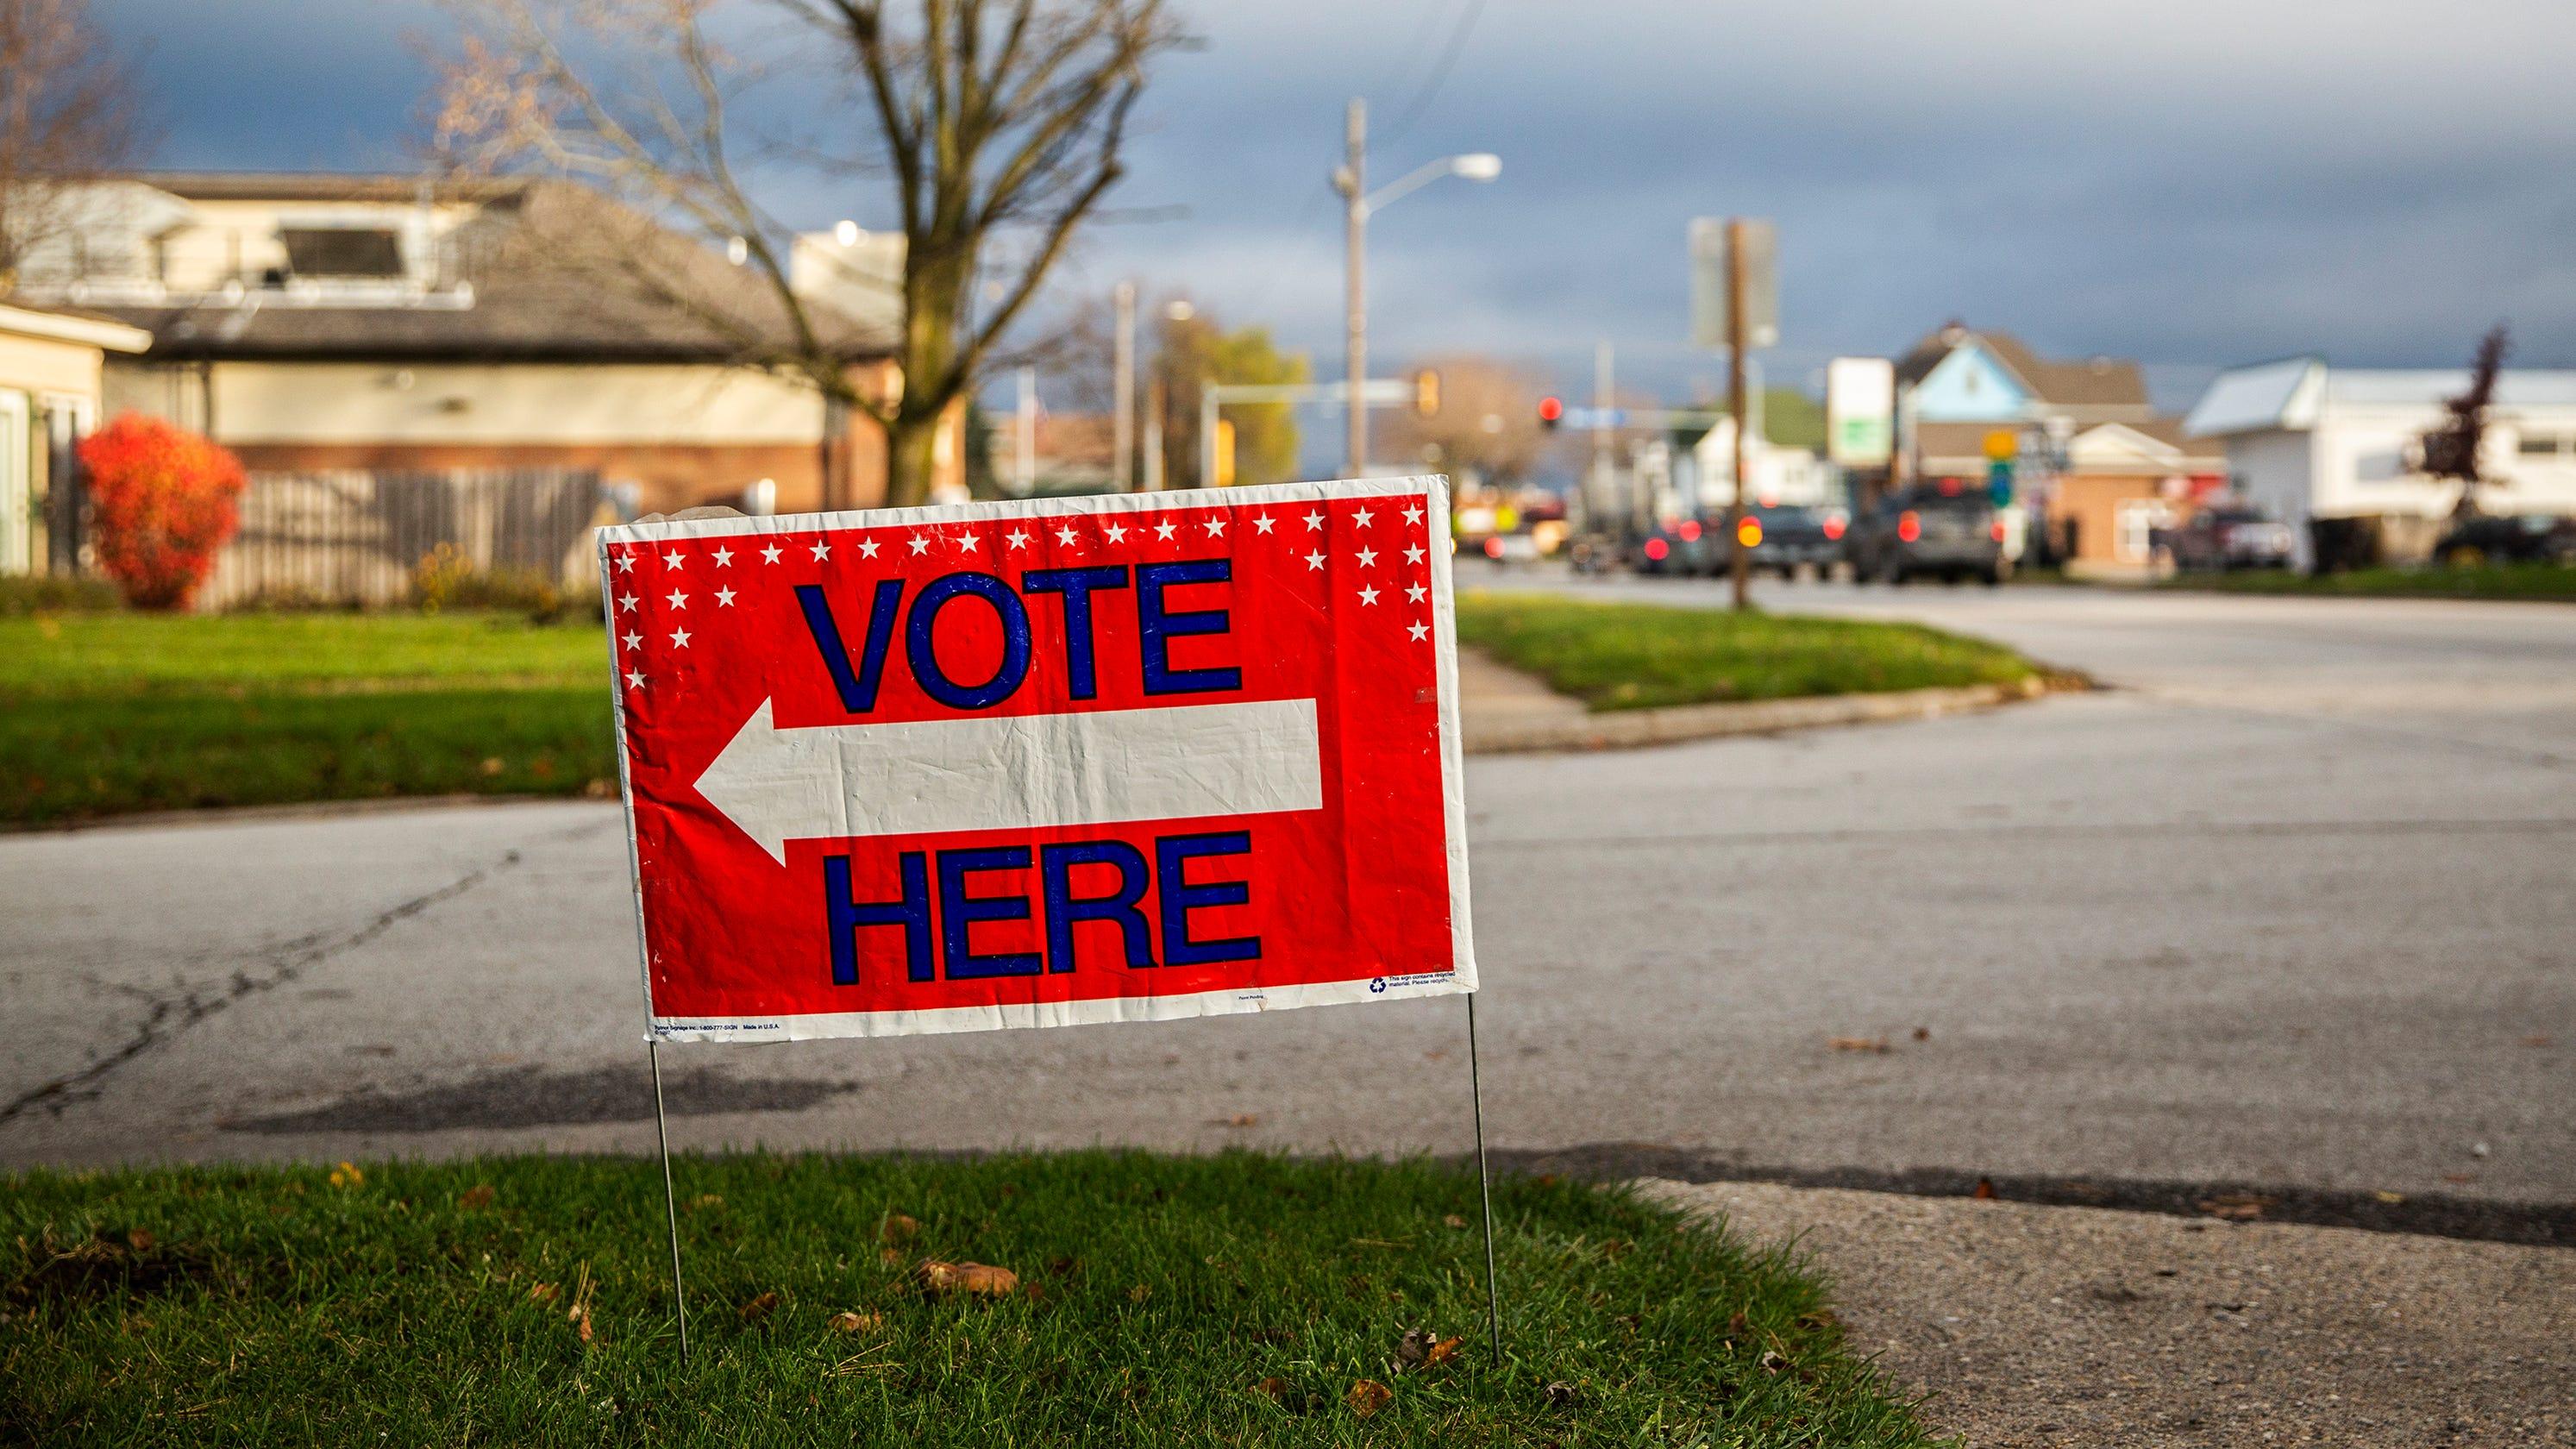 Iowa Tax Refund Schedule 2020 Election 2020: Who's running for Congress in Iowa in 2020?